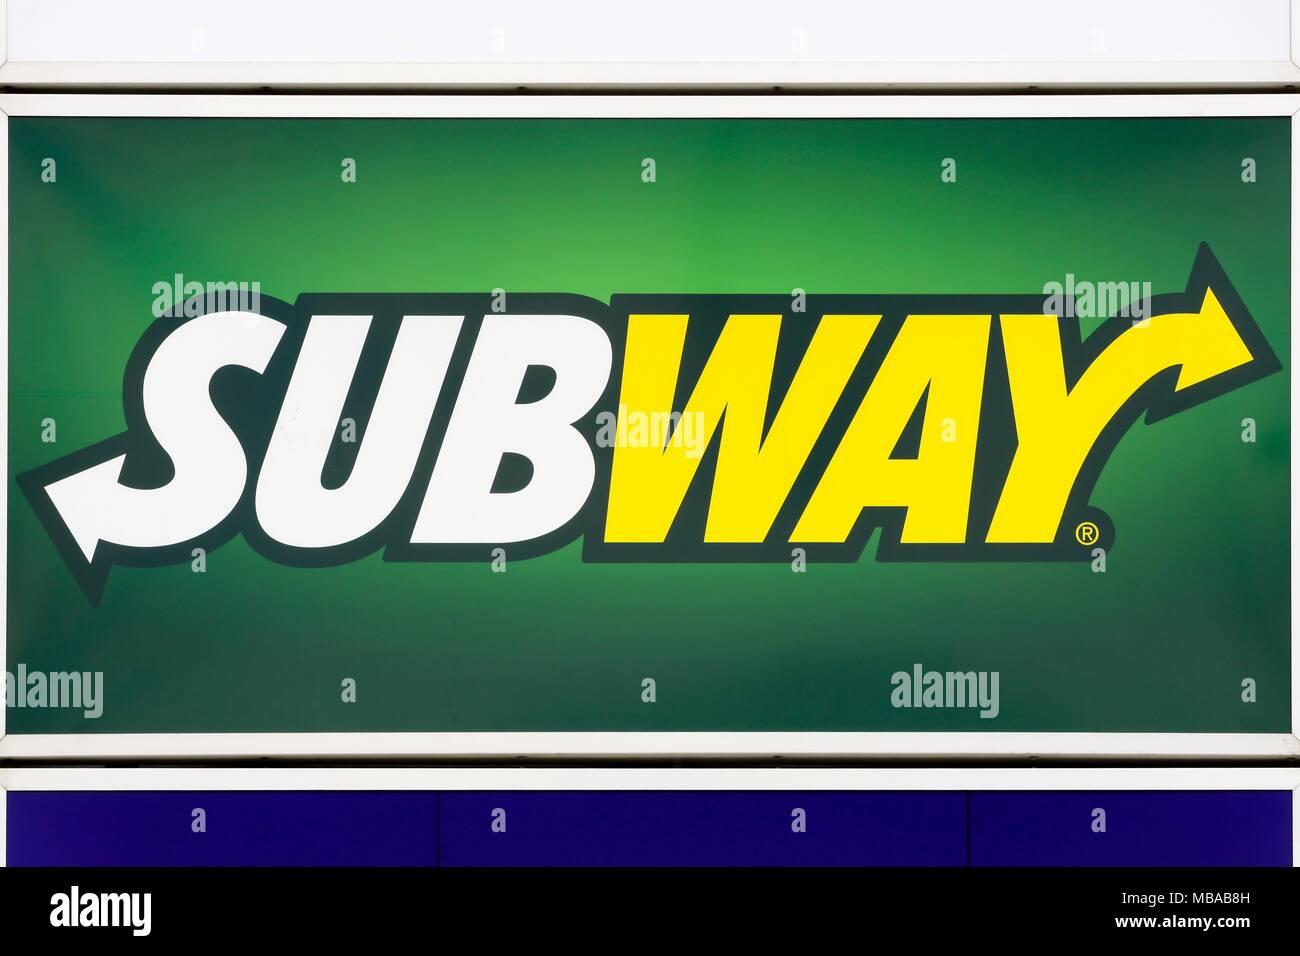 Italian Restaurant Logo With Flag: Subway Logo Stock Photos & Subway Logo Stock Images